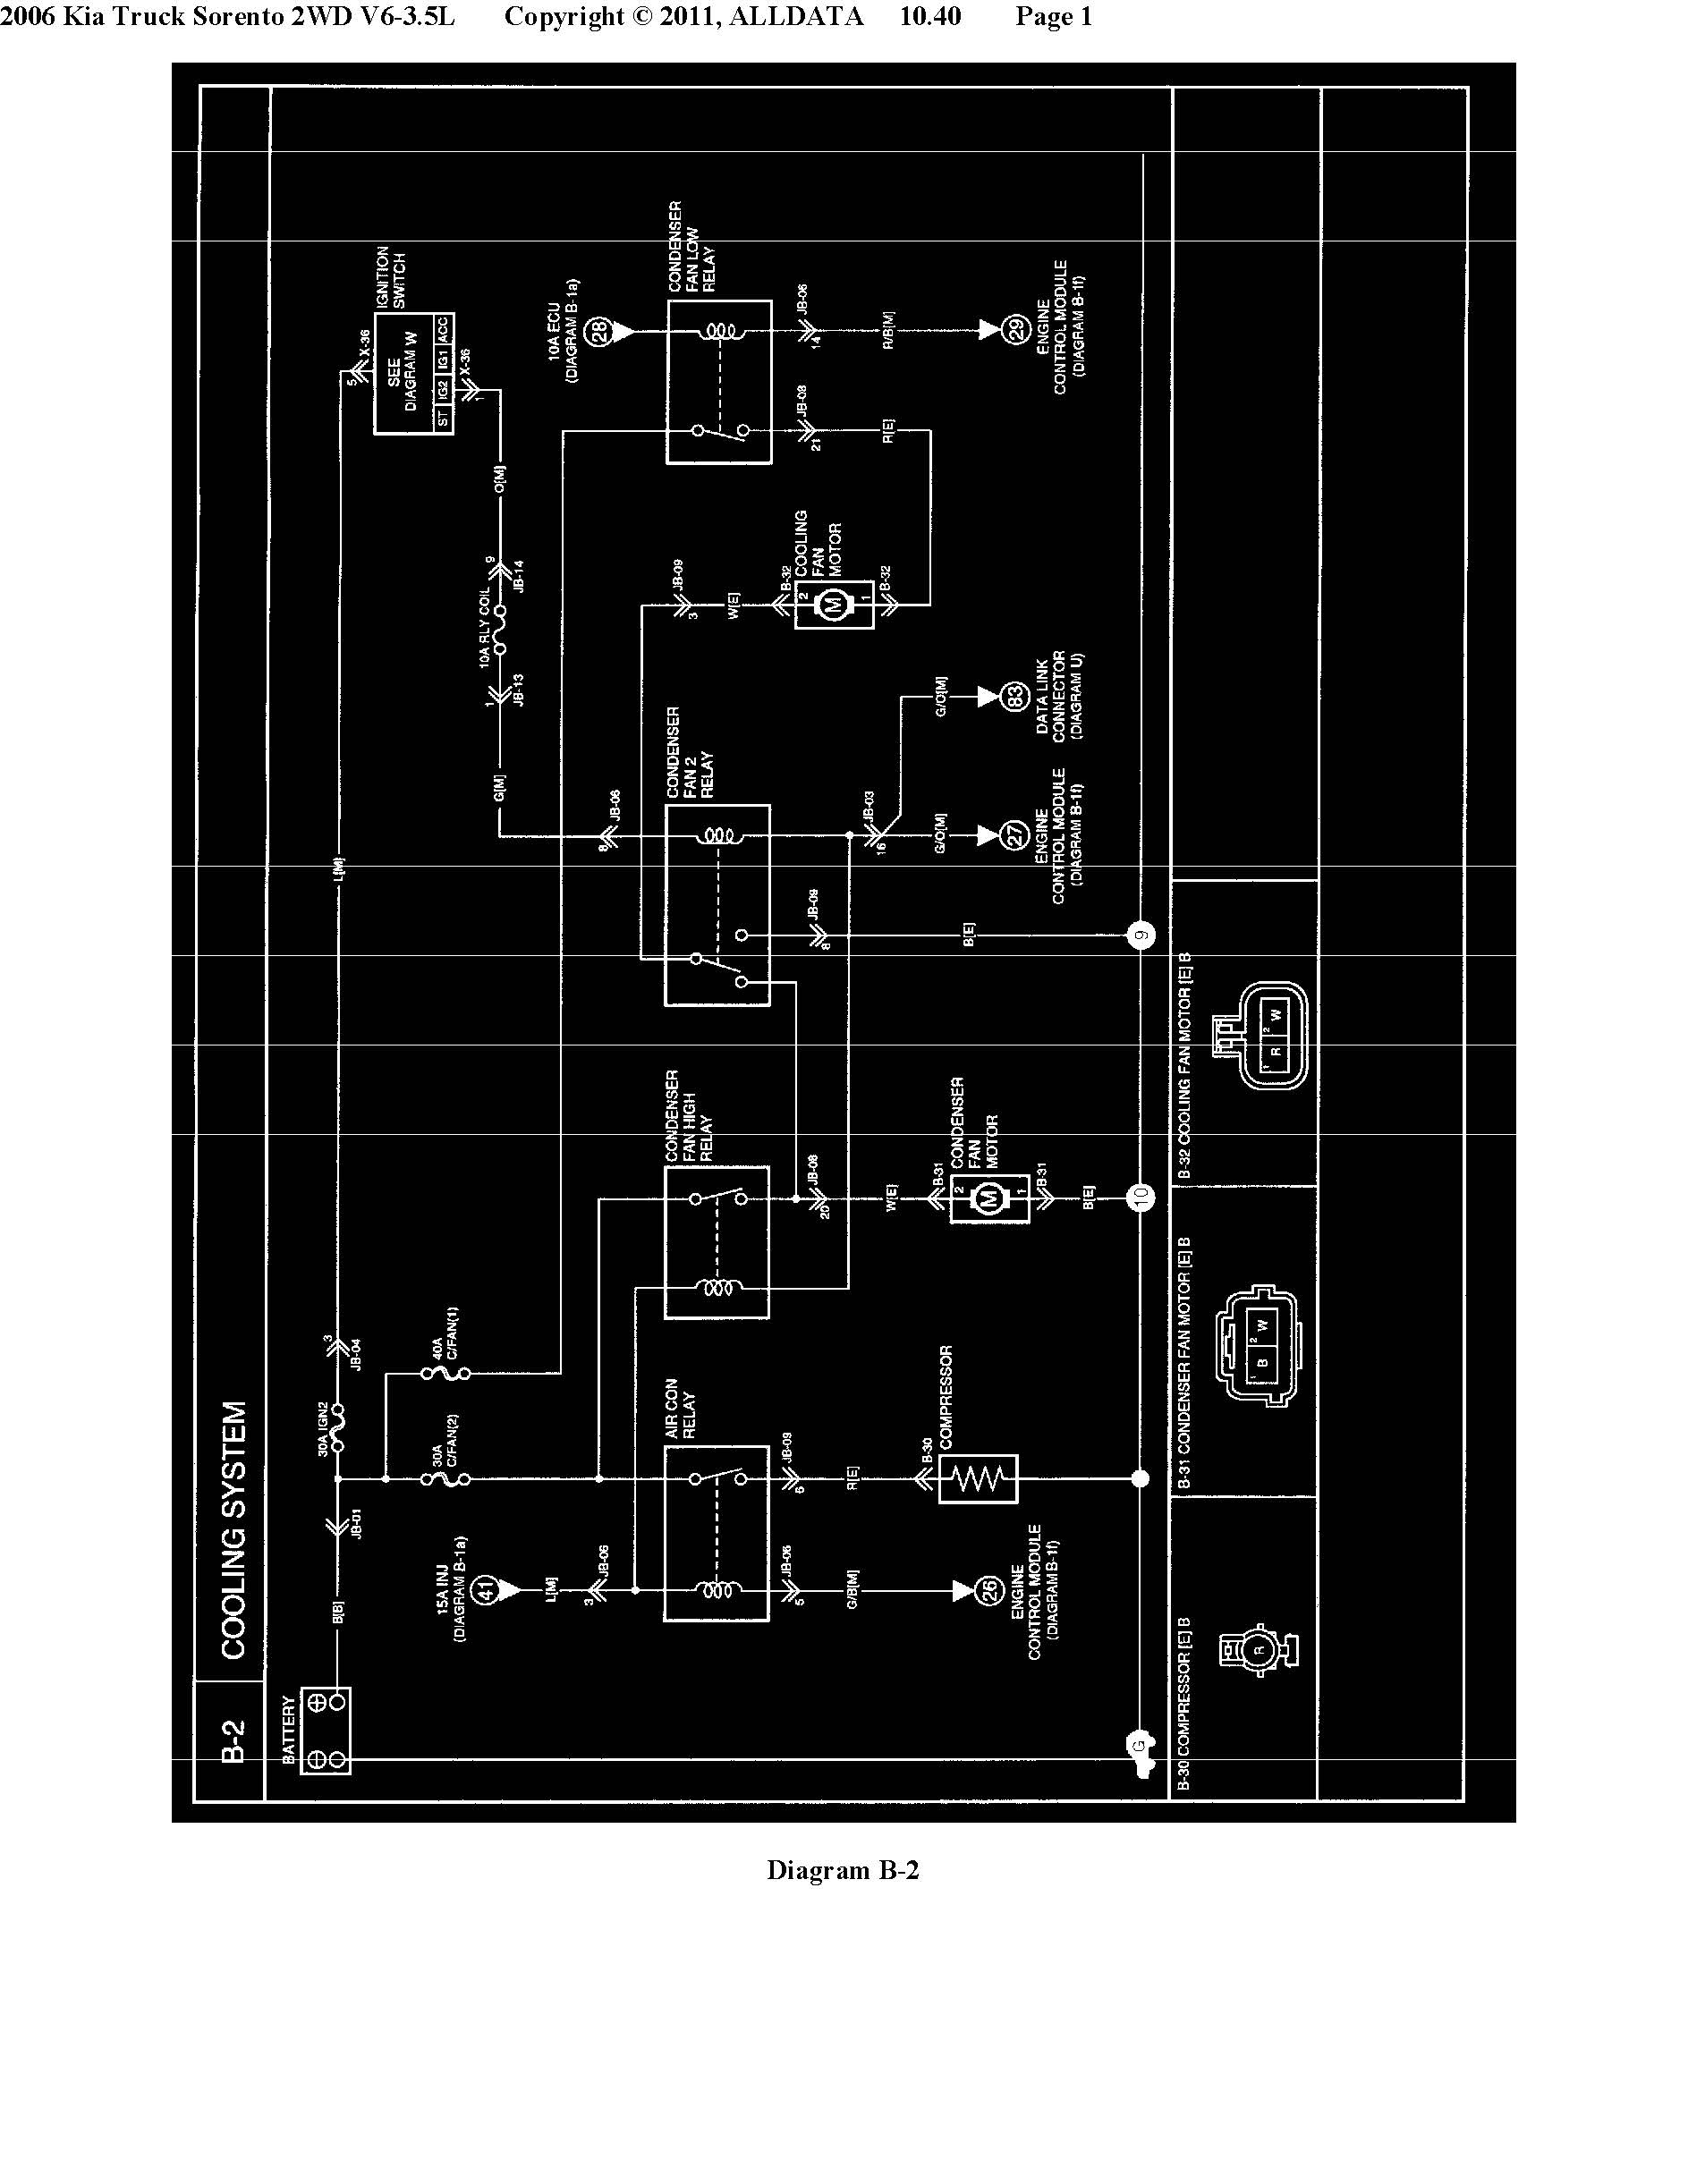 Need Wiring Diagram 2006 Kia Sorento Where Is The Shared